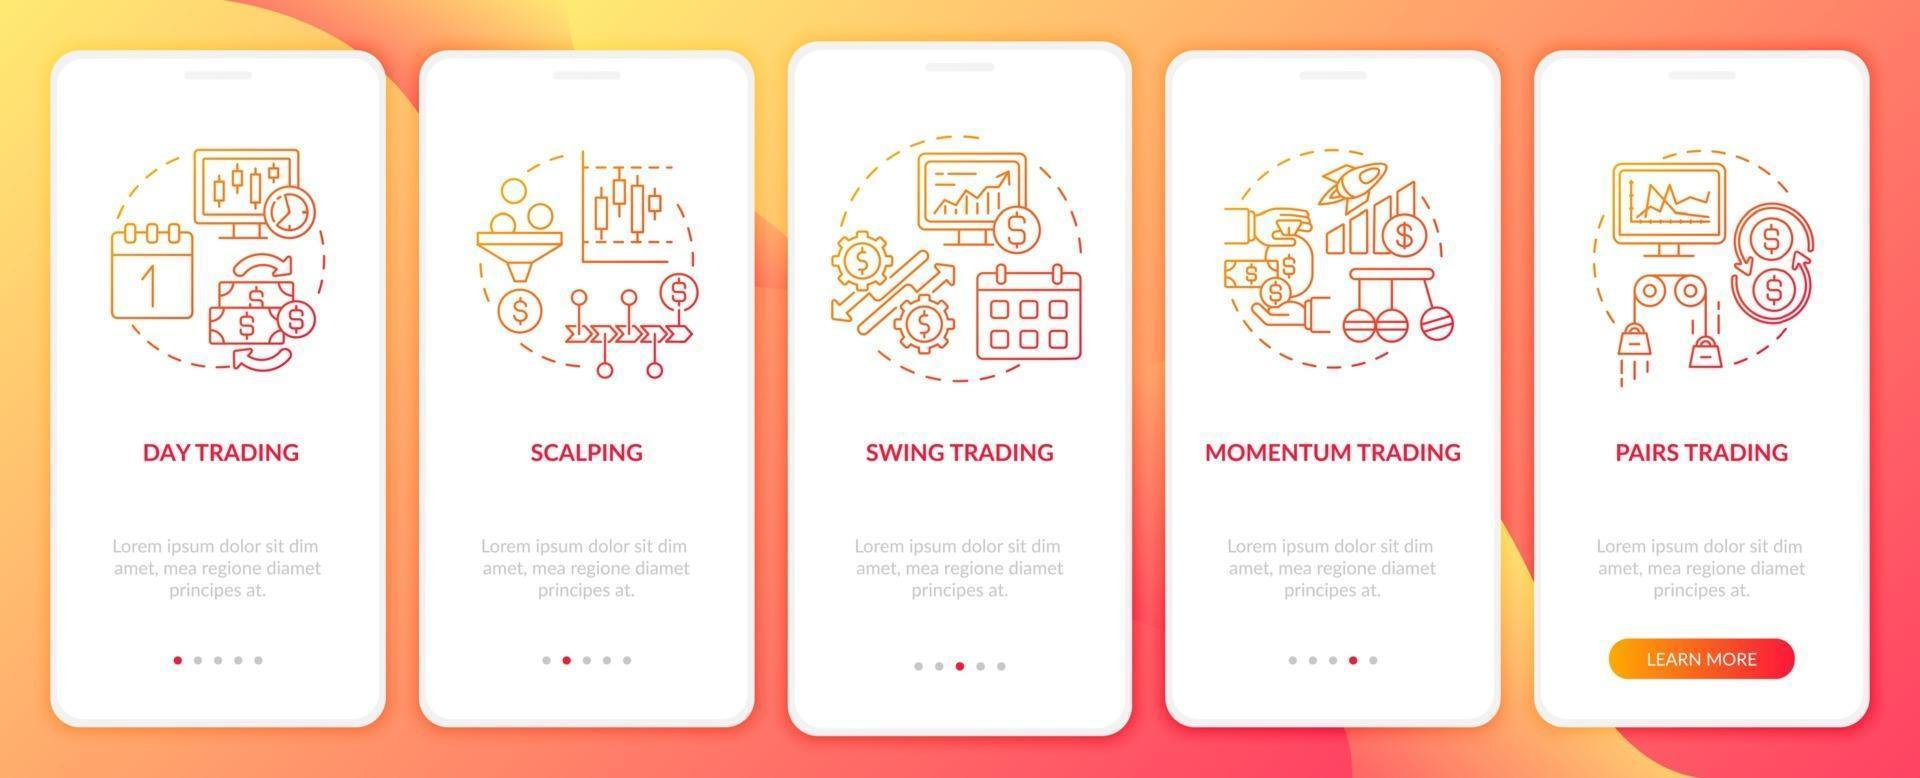 aktiehandelstrategier ombord mobilappsskärm med koncept vektor